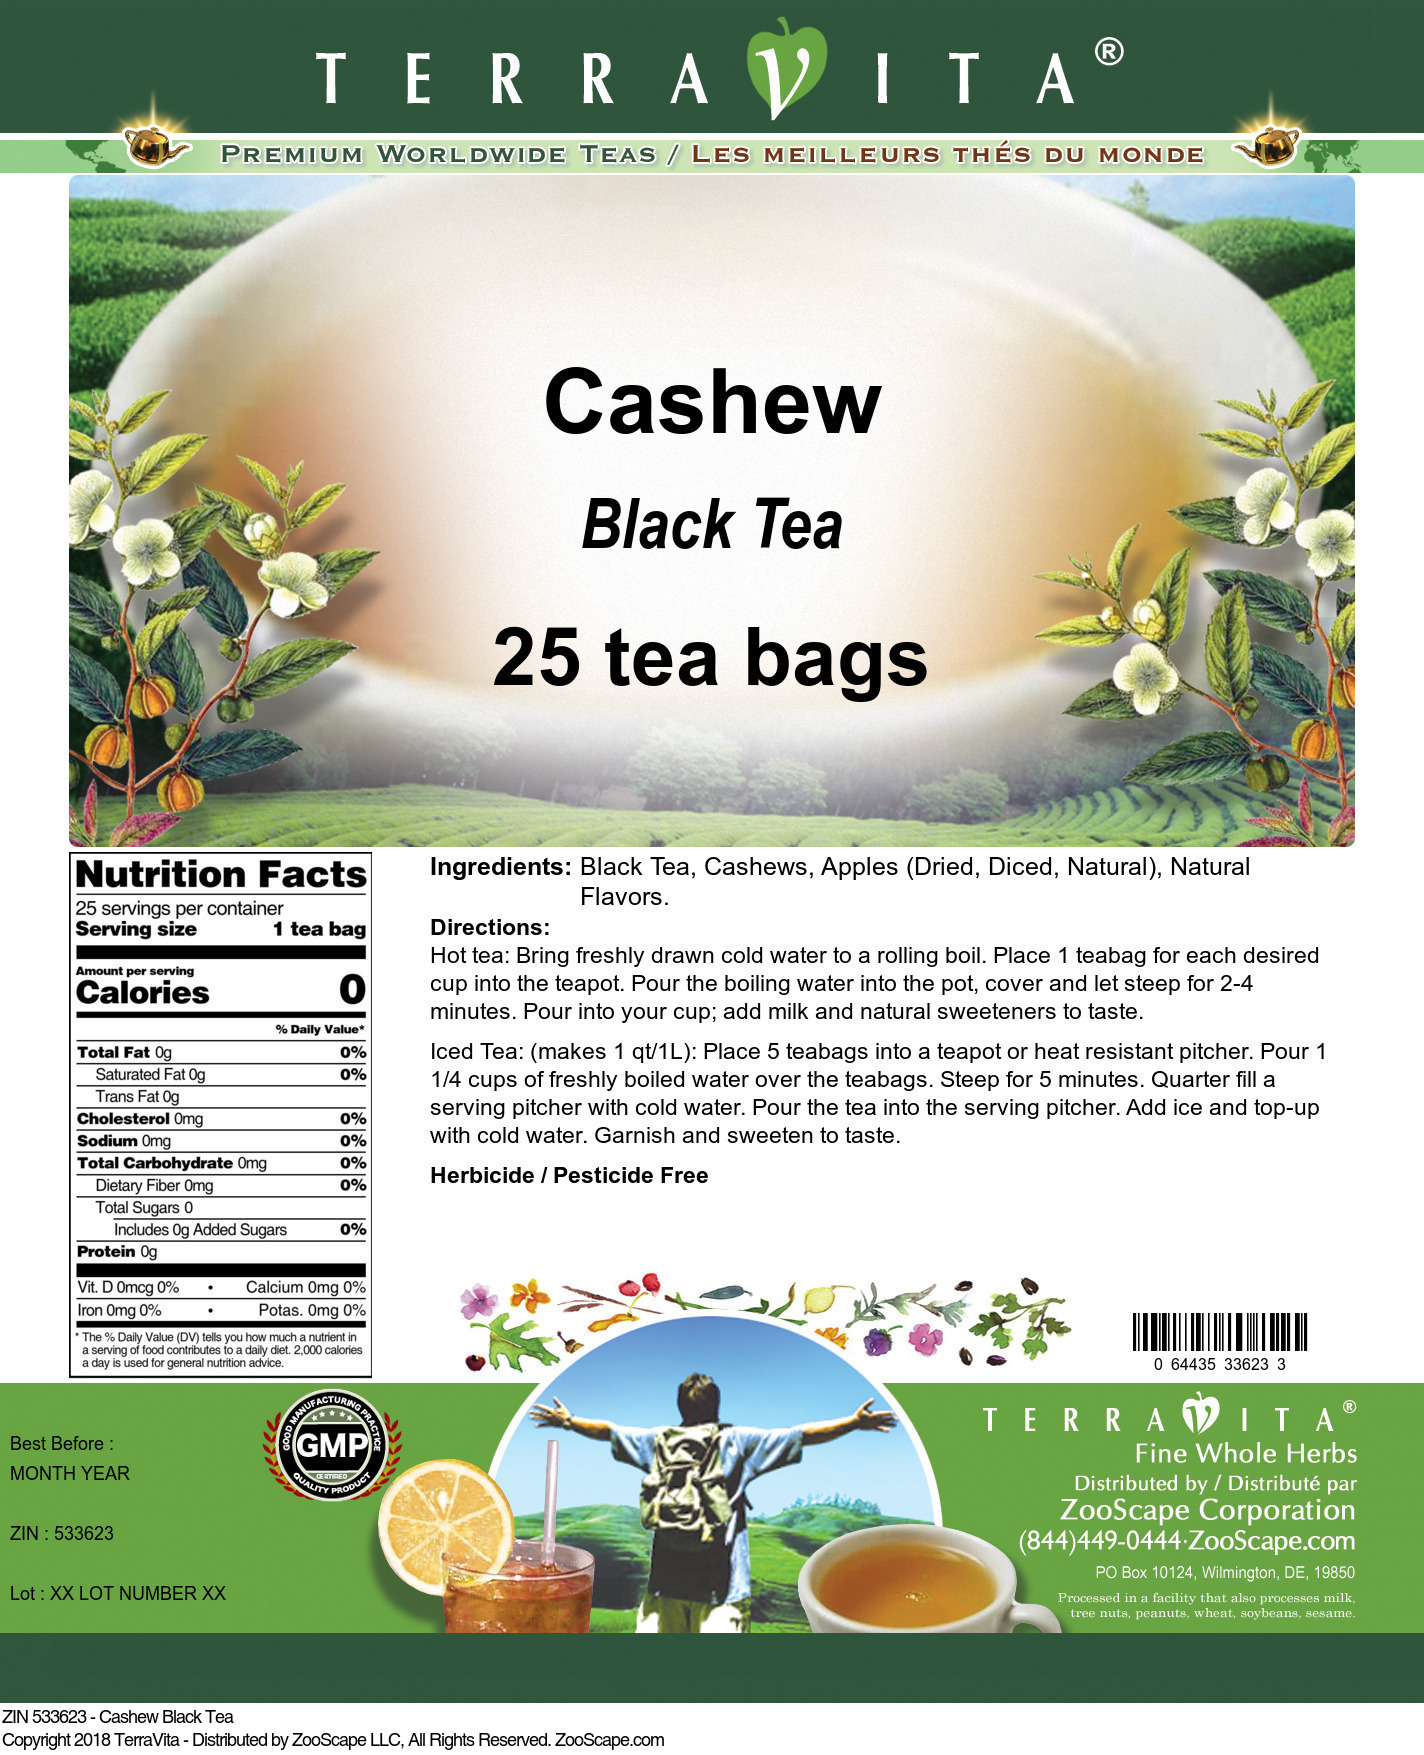 Cashew Black Tea